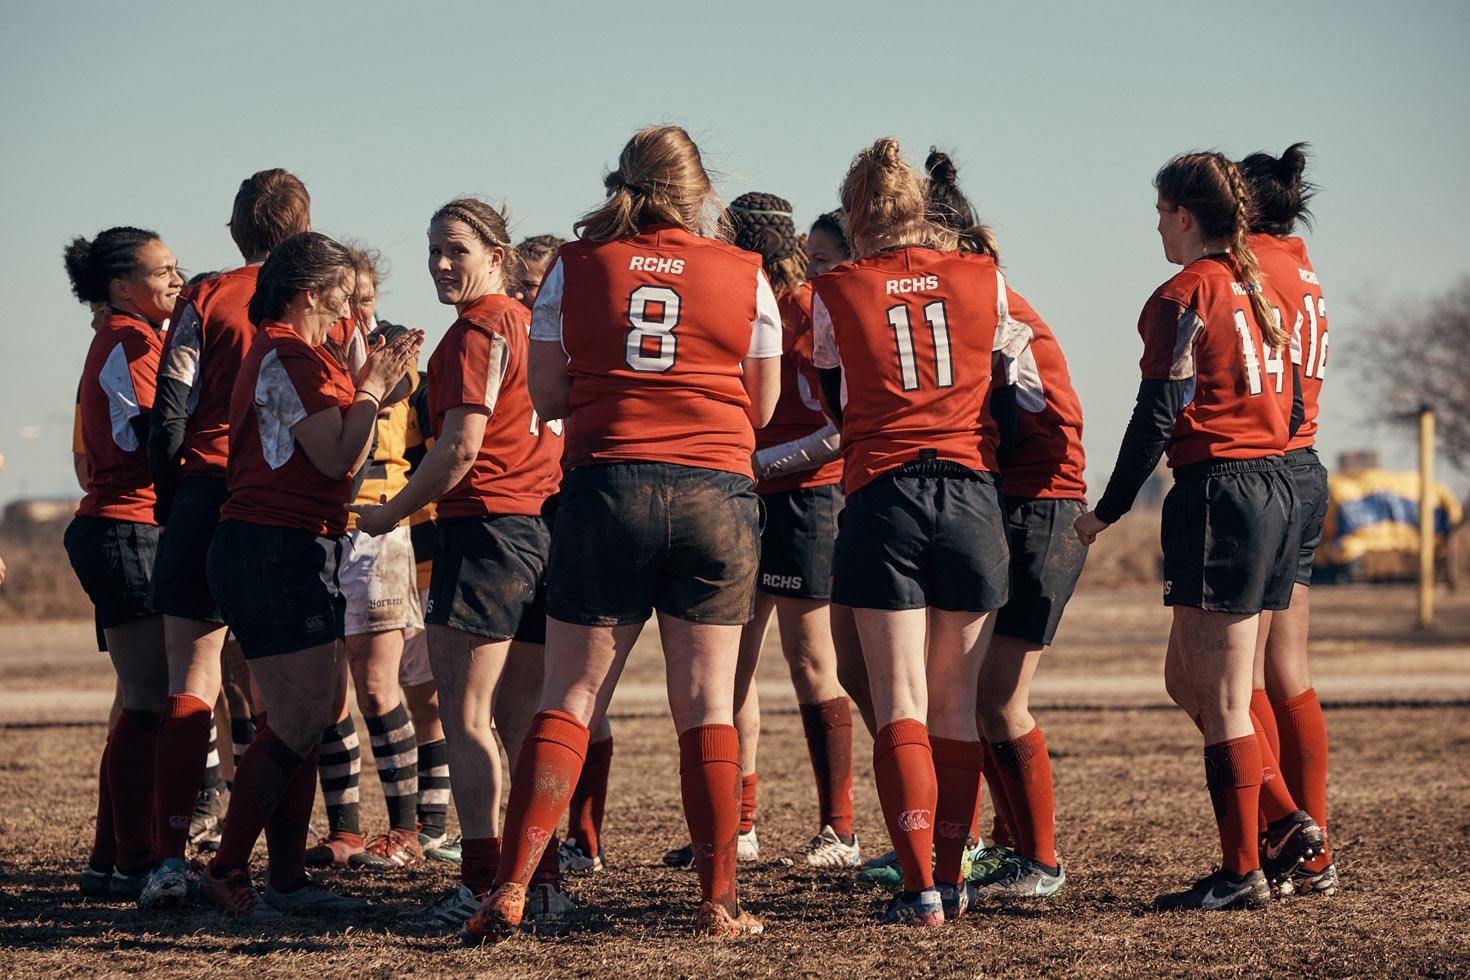 Rugby_1578_Web.jpg